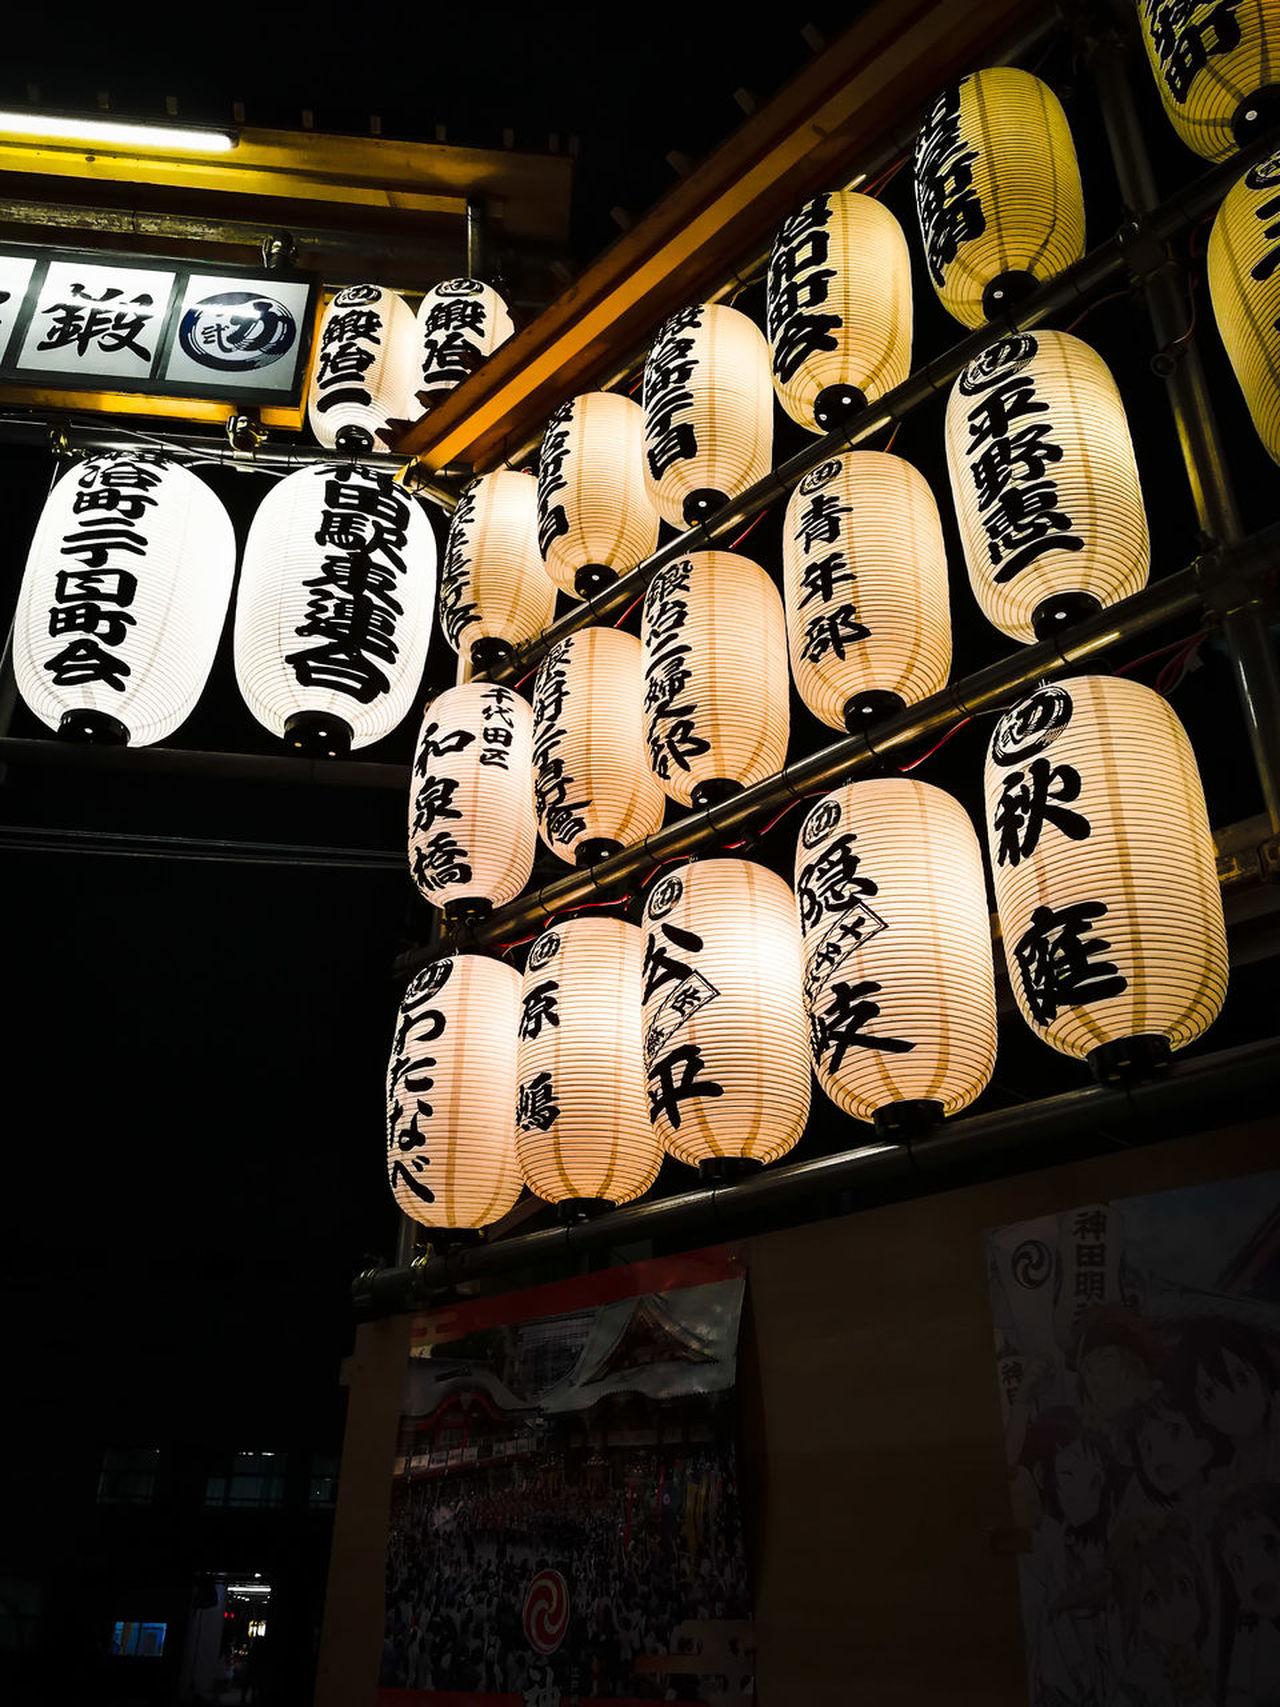 Festival Japanese Culture Paper Lanterns G8 Lumix